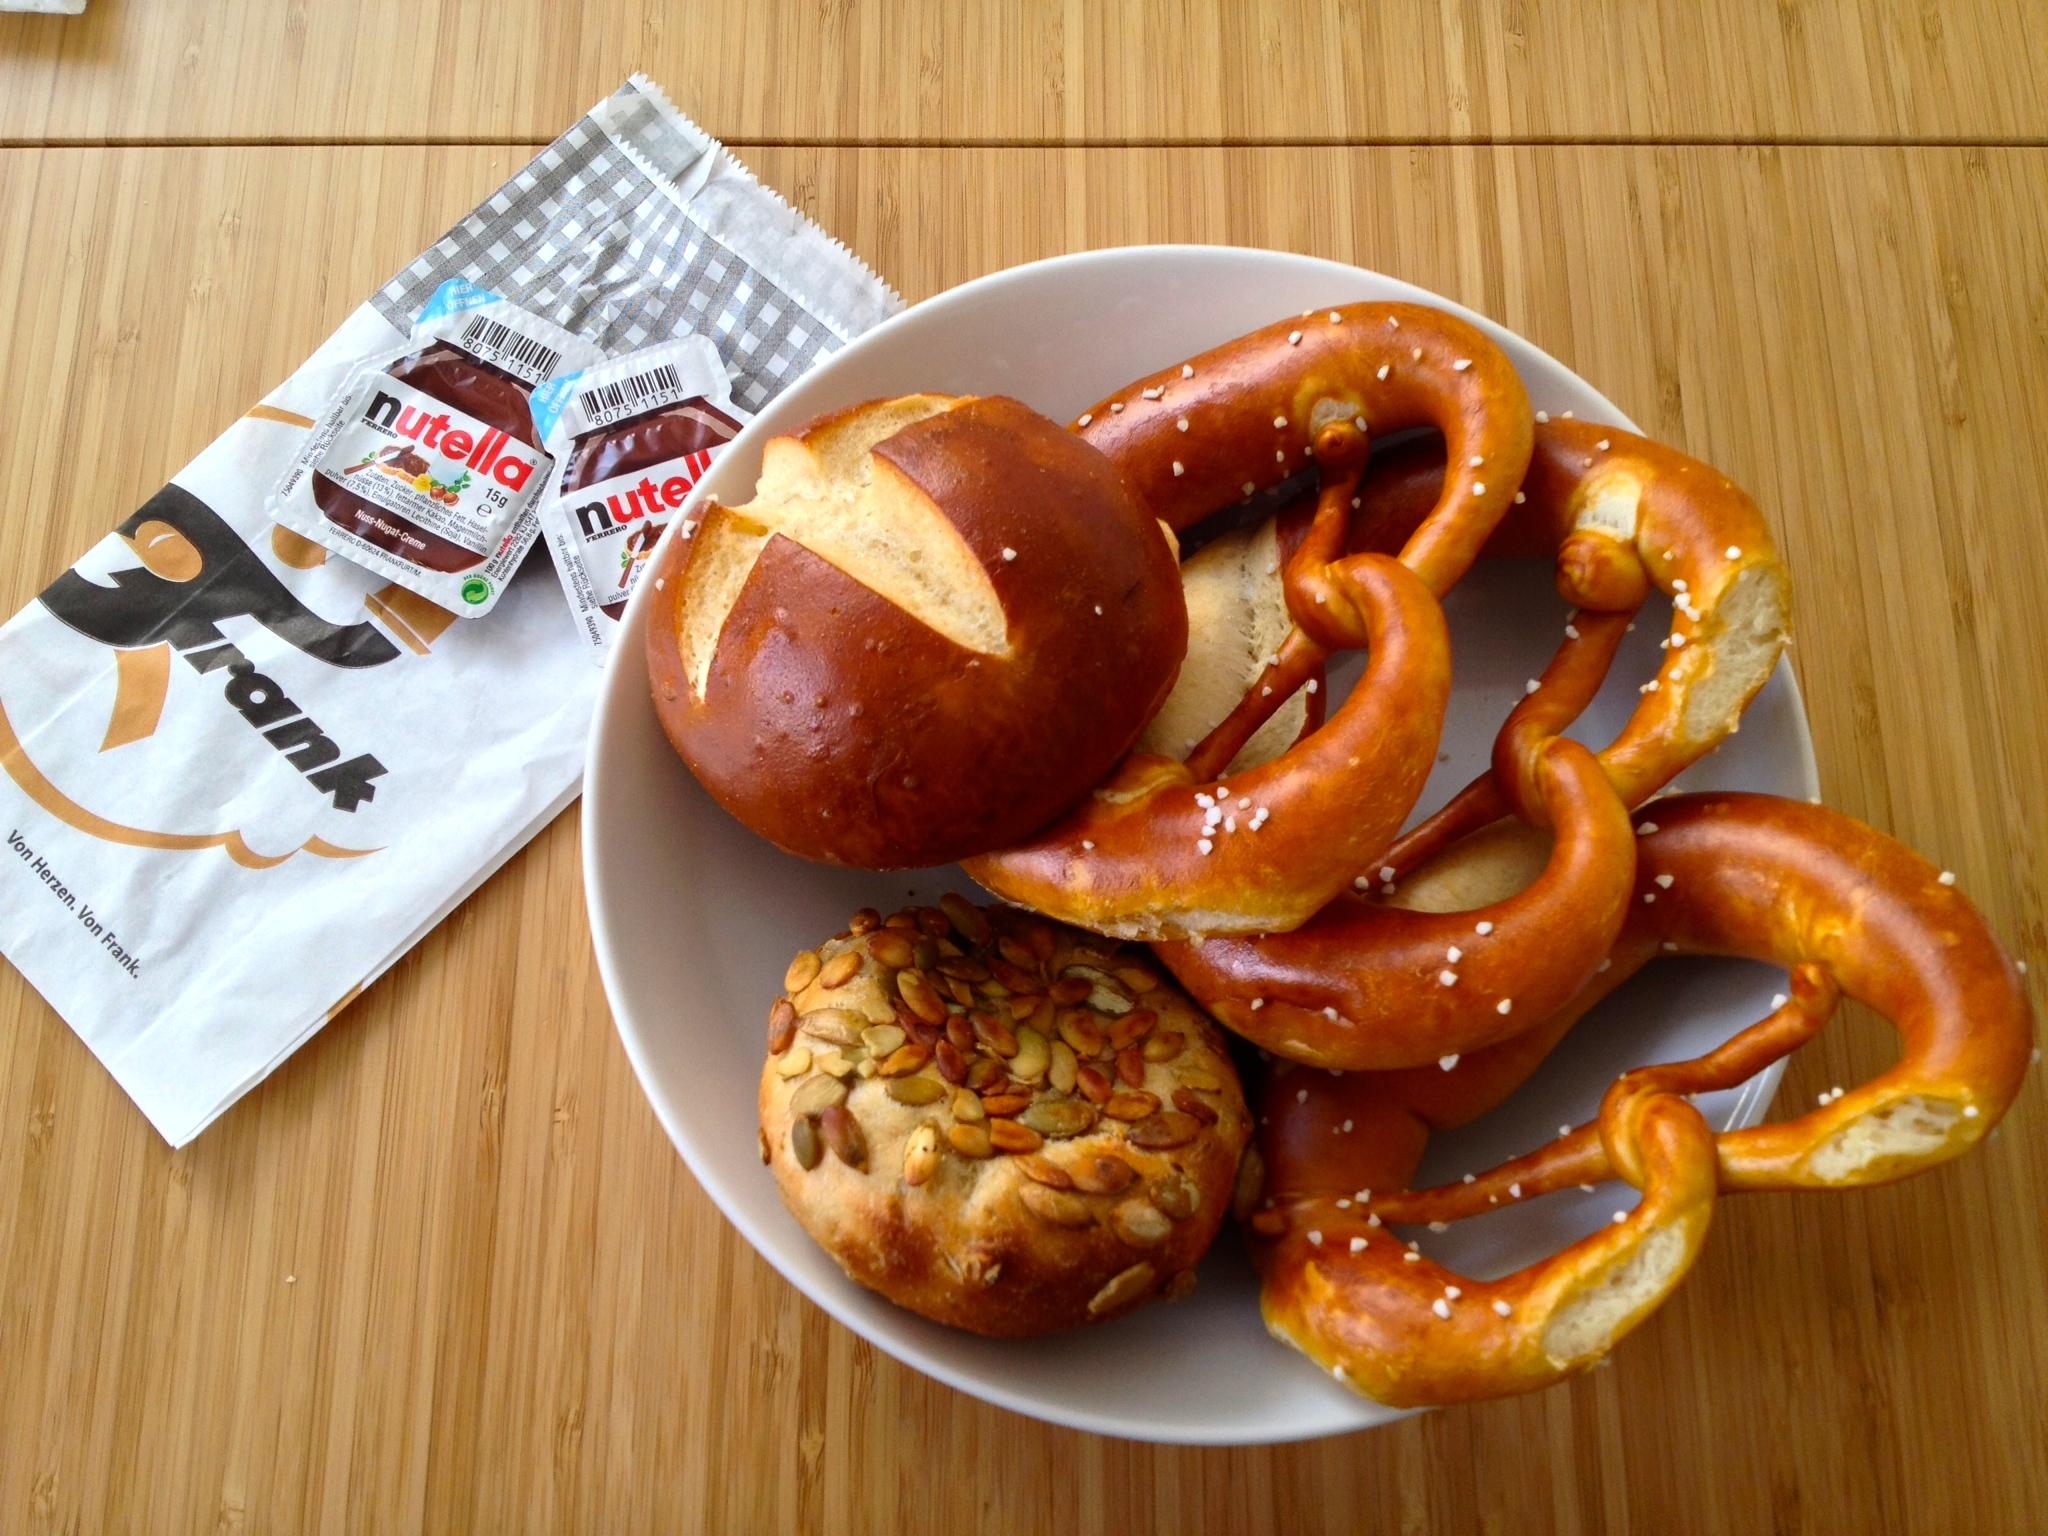 A Laugenbrötchen  at the top left, three pretzels, and a Kürbiskern Brötchen to the bottom left (click for a larger image)